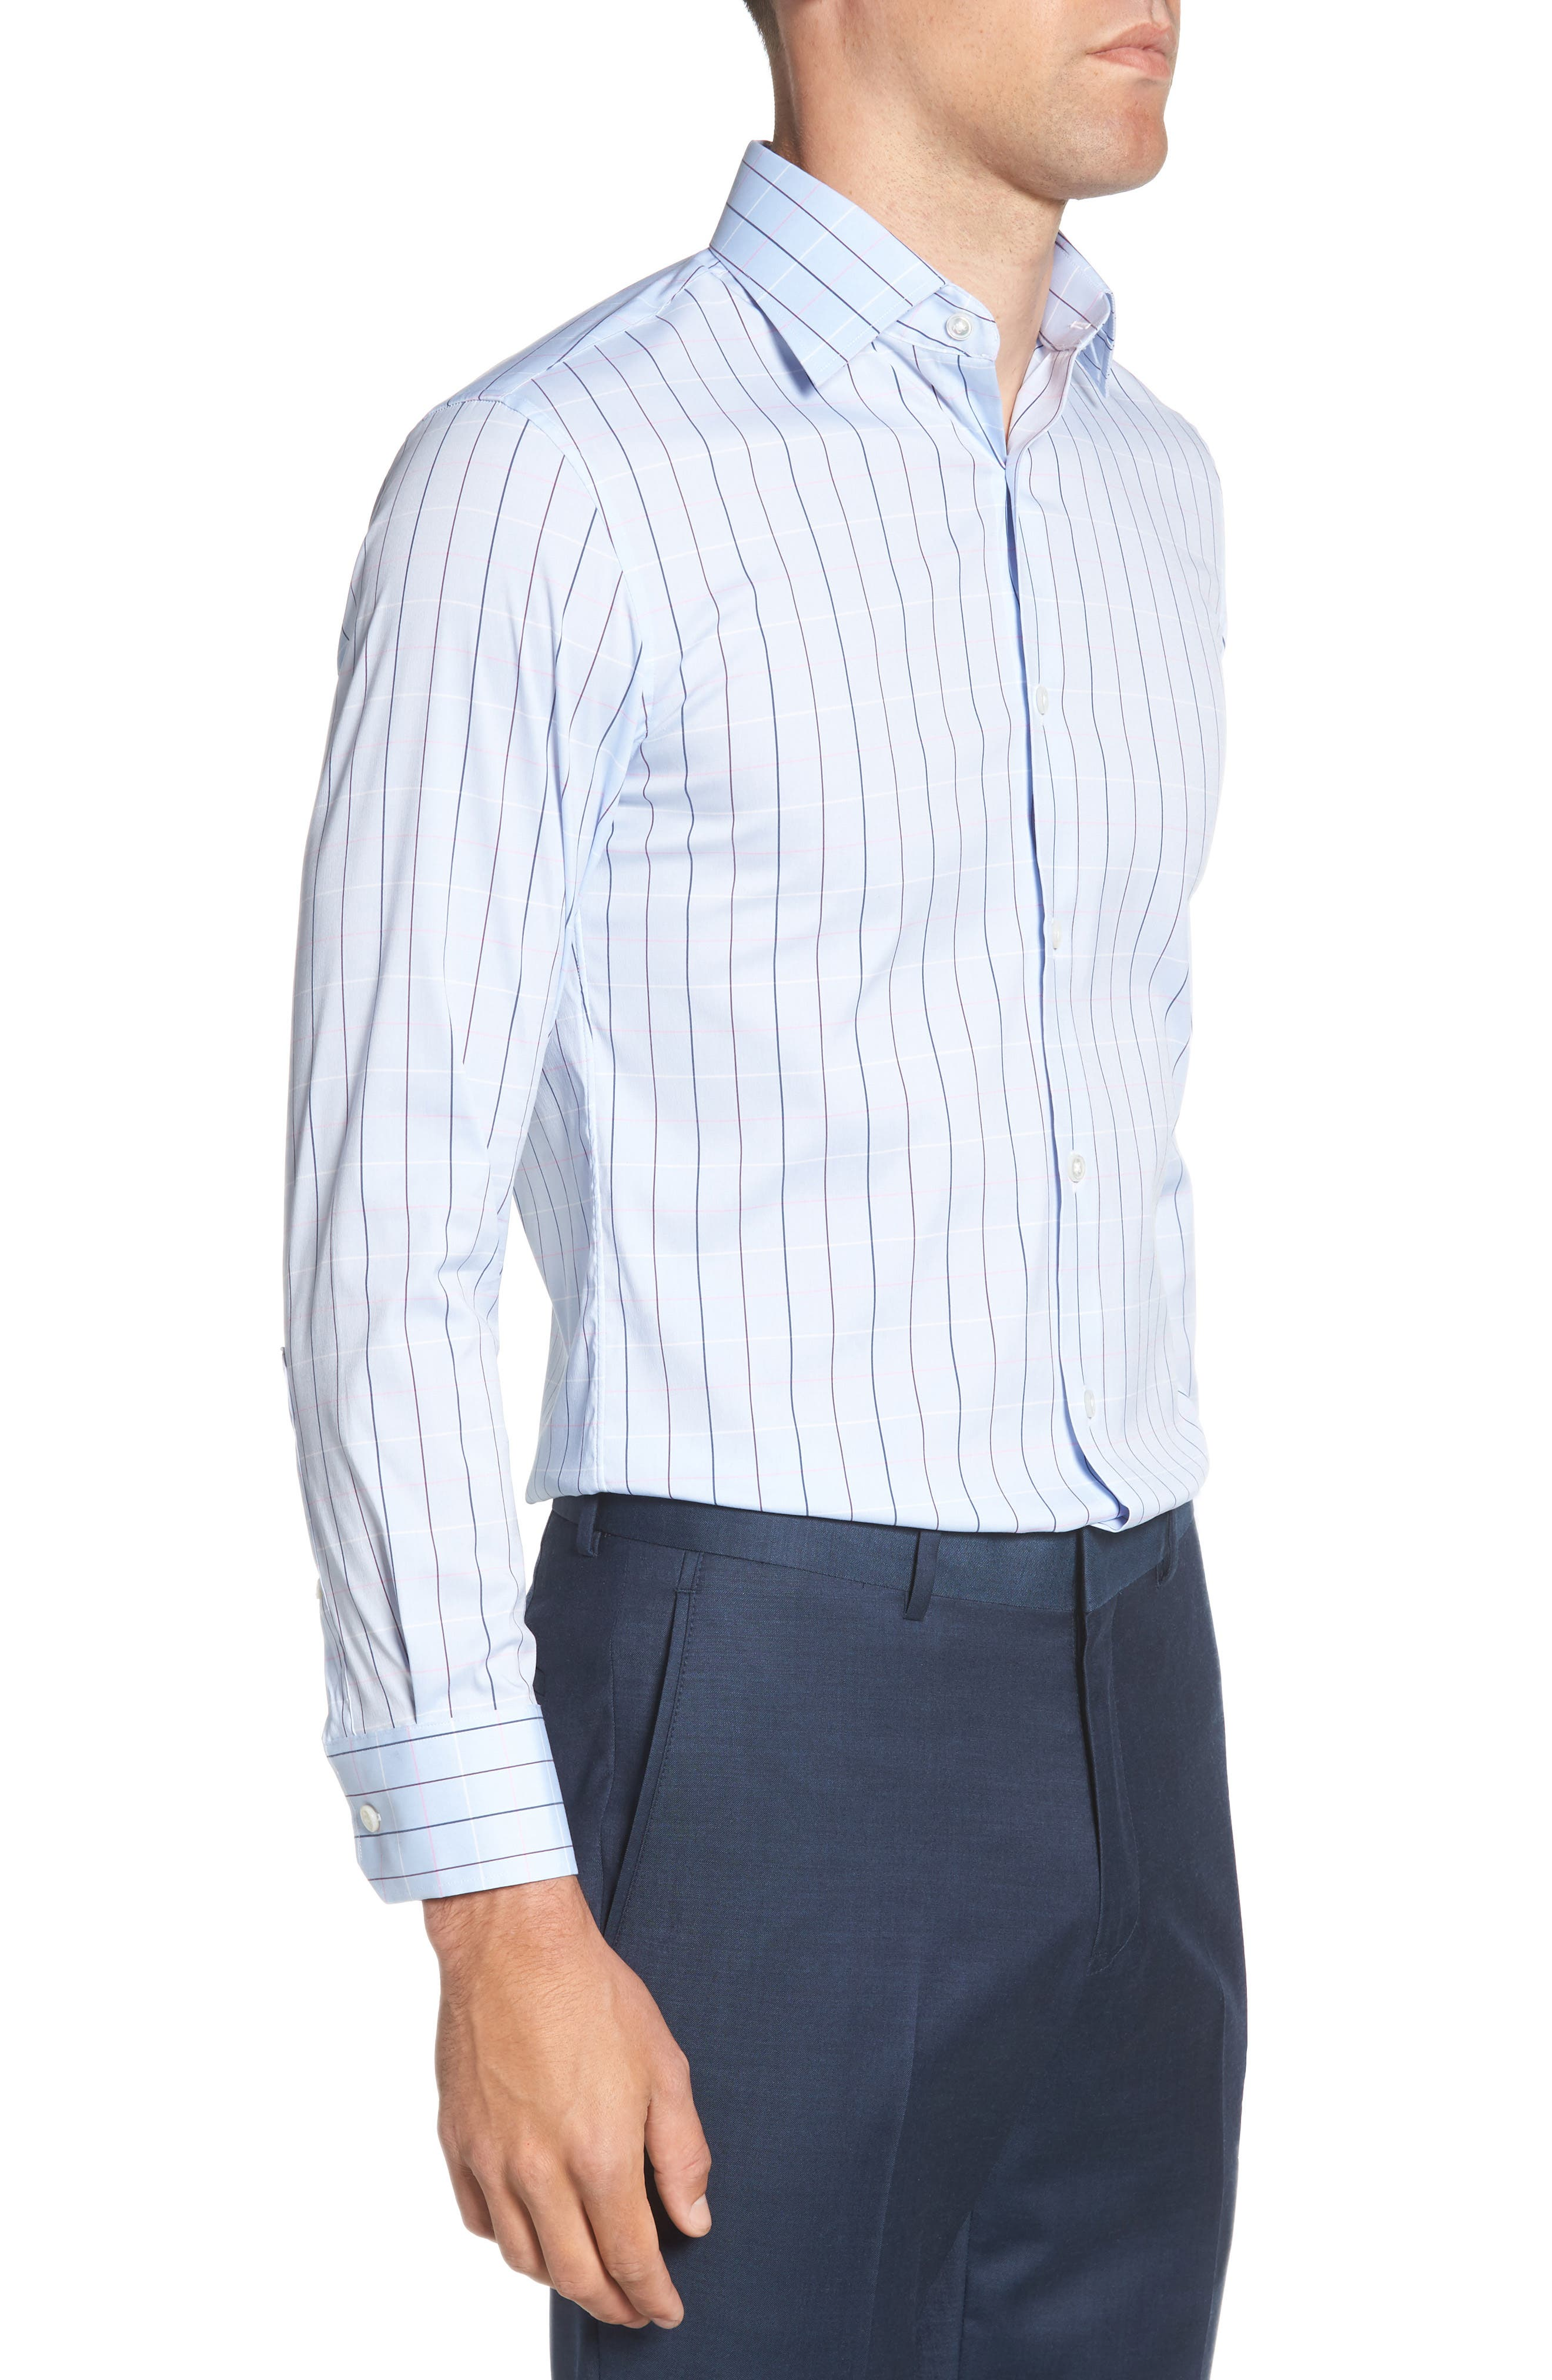 Jetsetter Slim Fit Stretch Check Dress Shirt,                             Alternate thumbnail 4, color,                             400